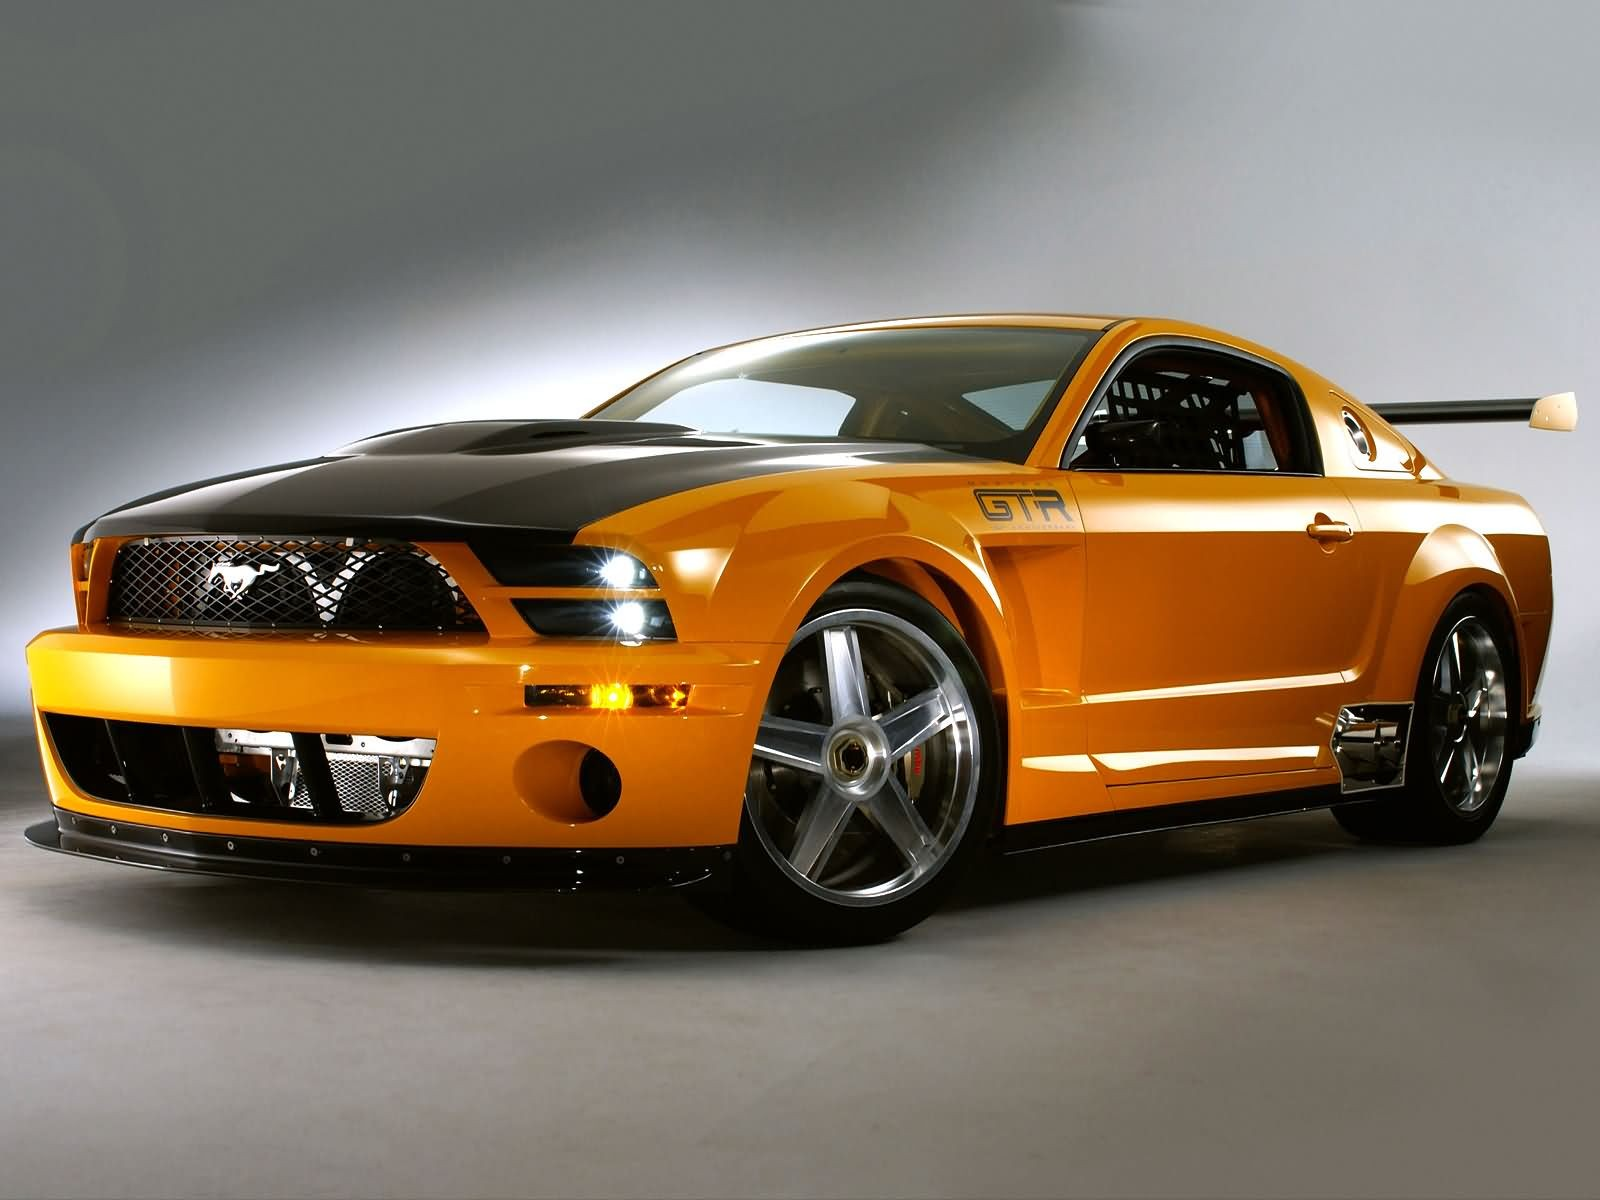 Mustang Wallpapers 1 1600x1200